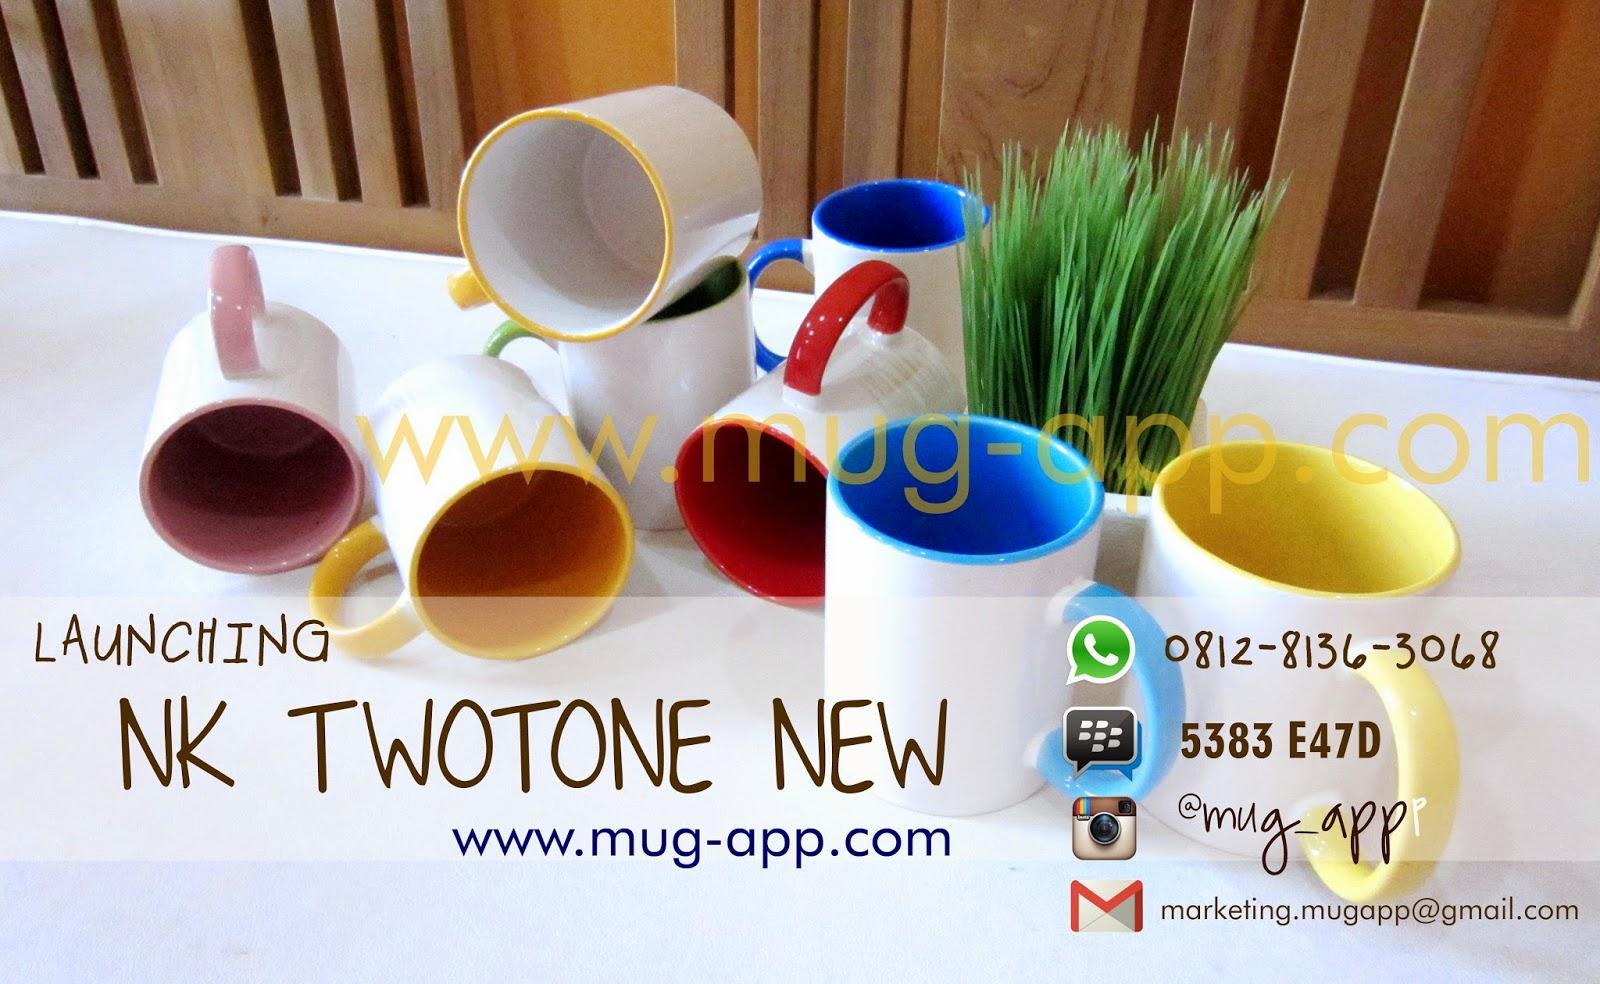 Mug NK Twotone New